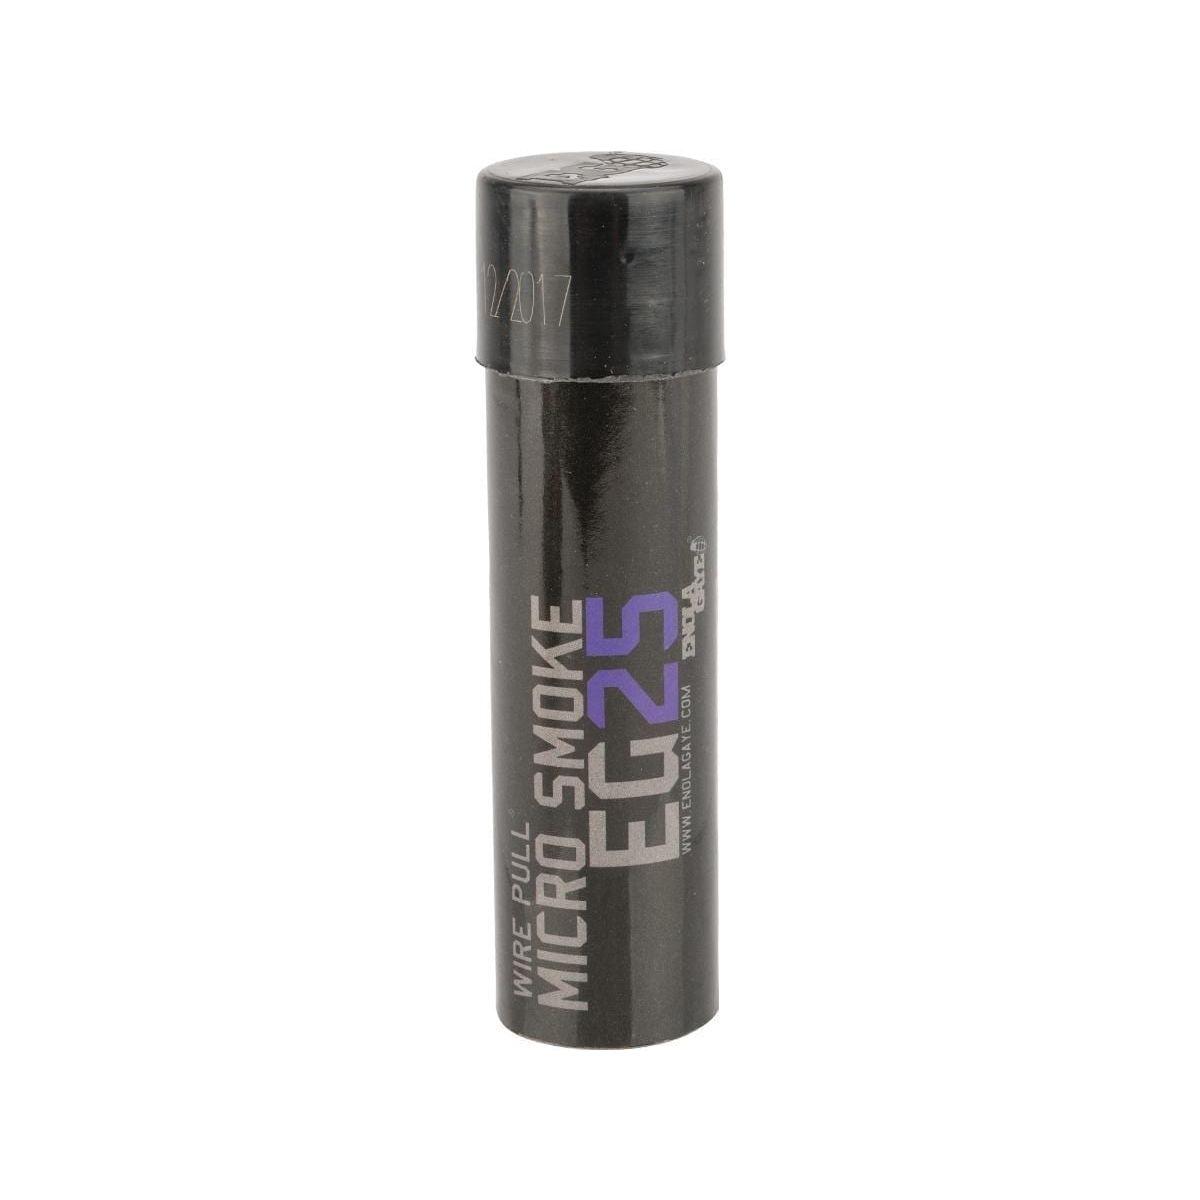 EG25 Green Smoke Grenade small